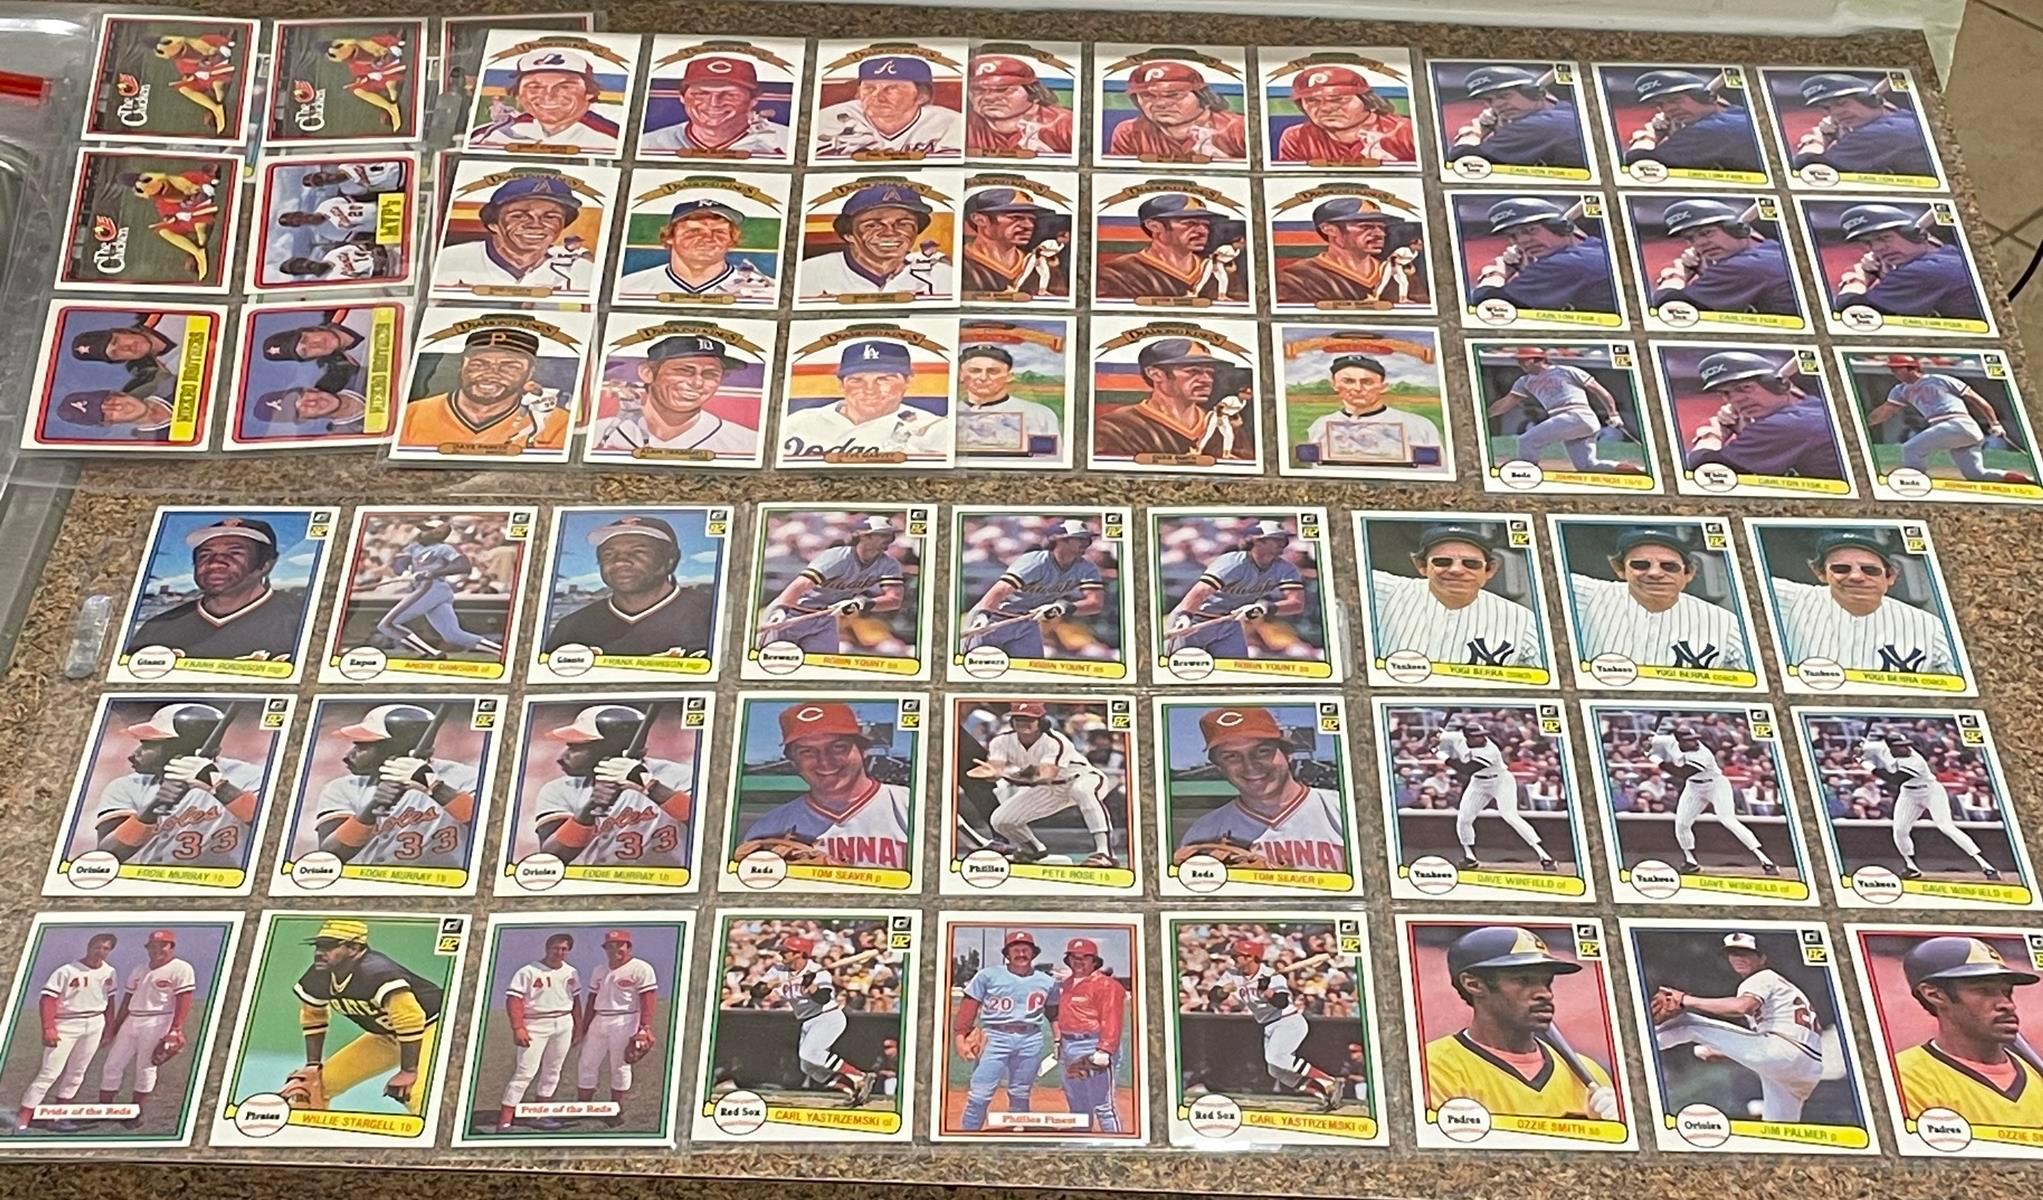 Vintage 1982 Donruss Lot of 67 Baseball Cards (Rose, Yount, Seaver, Yaz, Berra, Palmer, Winfield, Smith, Bench, Dawson, Stargell, Murray, Etc..)